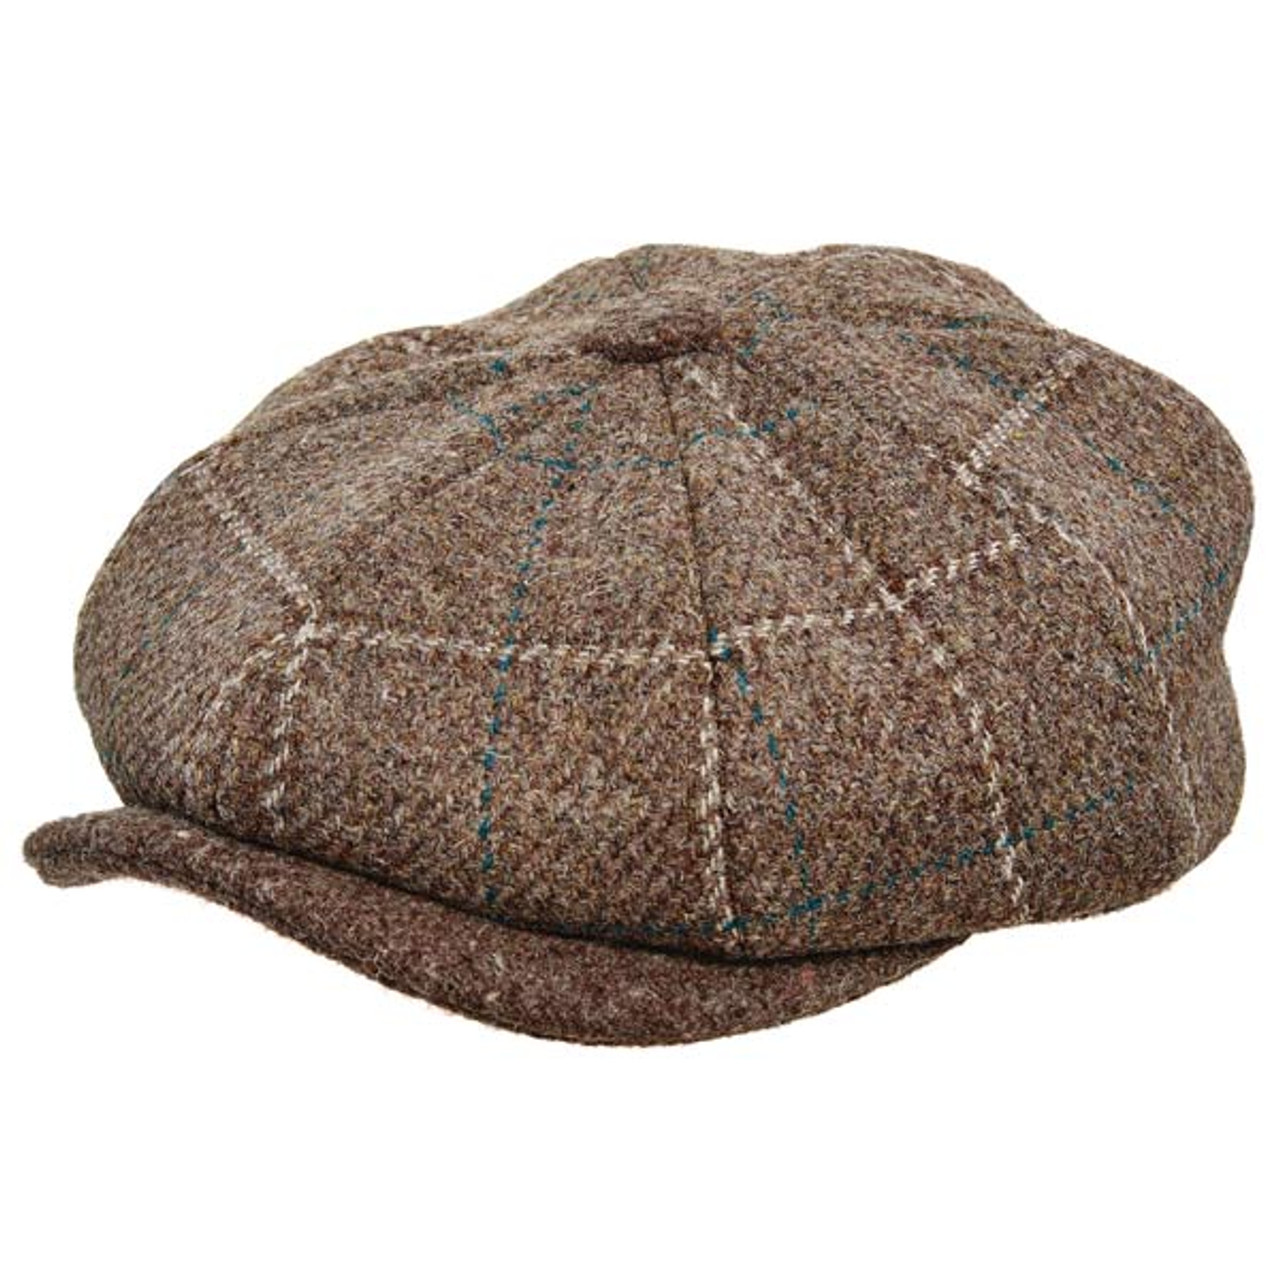 bf8fcb85 Stetson | Authentic Italian Wool Newsboy Cap | Hats Unlimited